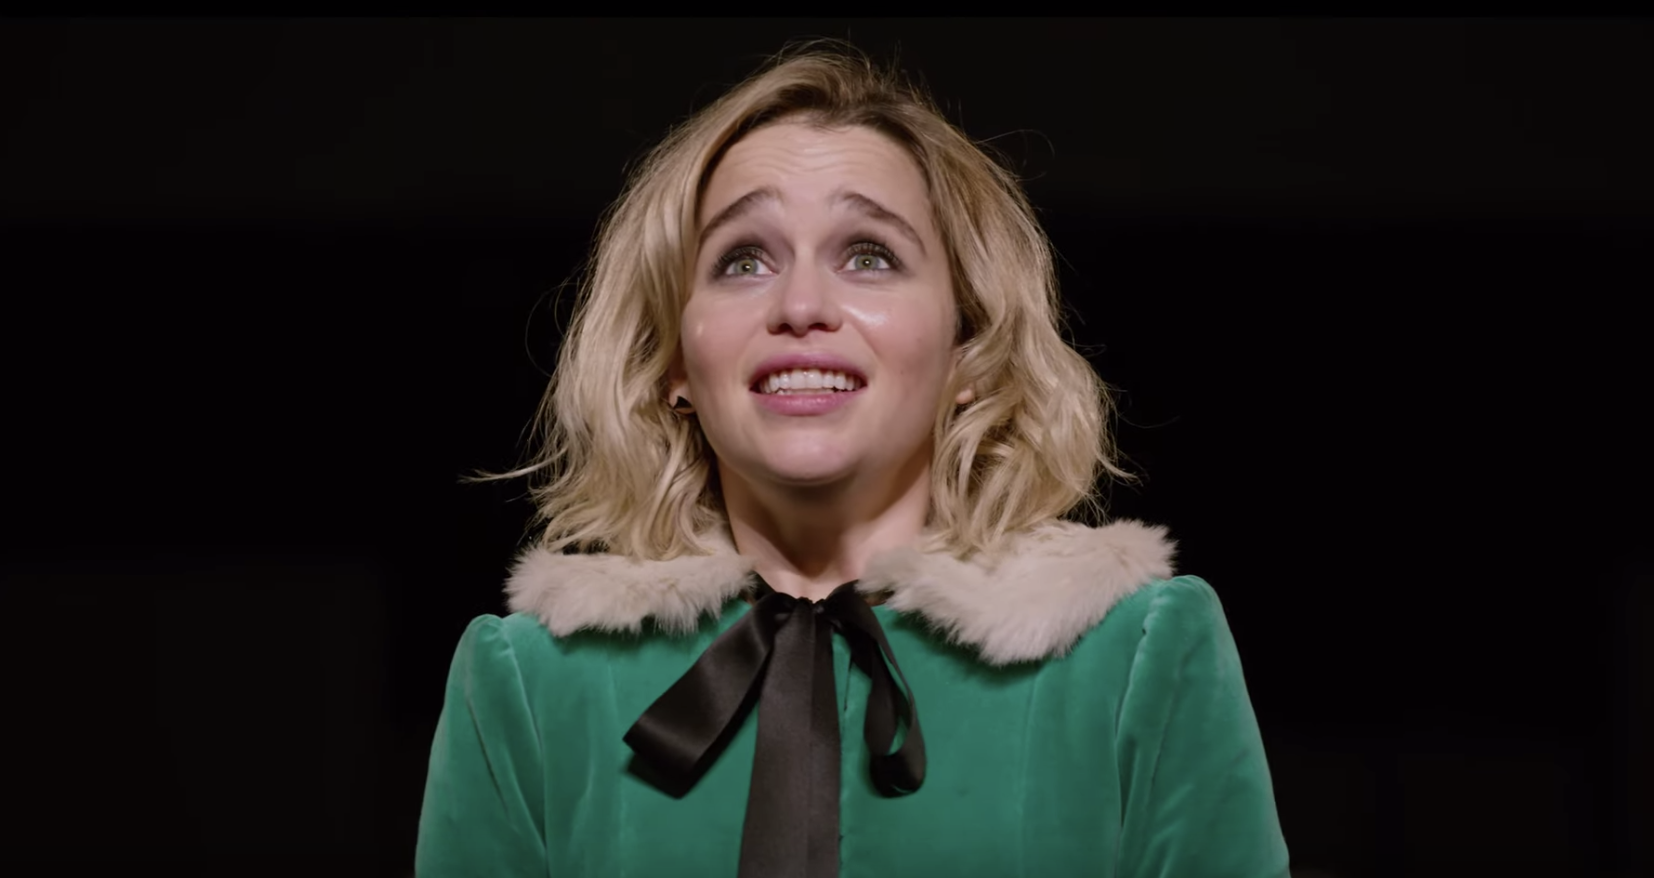 Emilia Clarke sings Wham! classic in new Last Christmas trailer